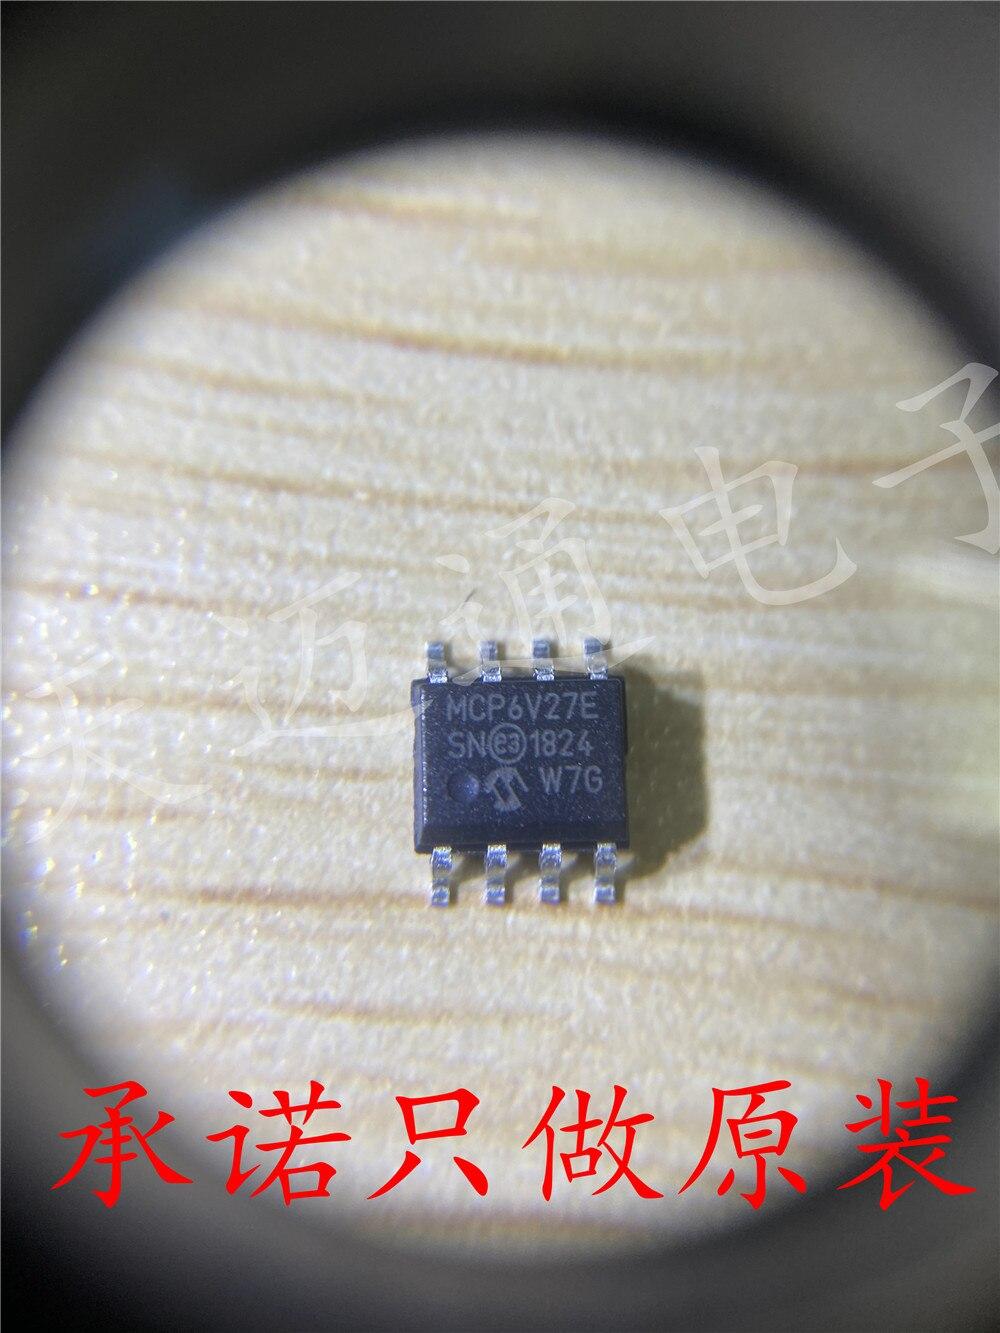 شحن مجاني MCP6V27-E/SN MCP6V27E SOP8 رقاقة BOM 10 قطعة